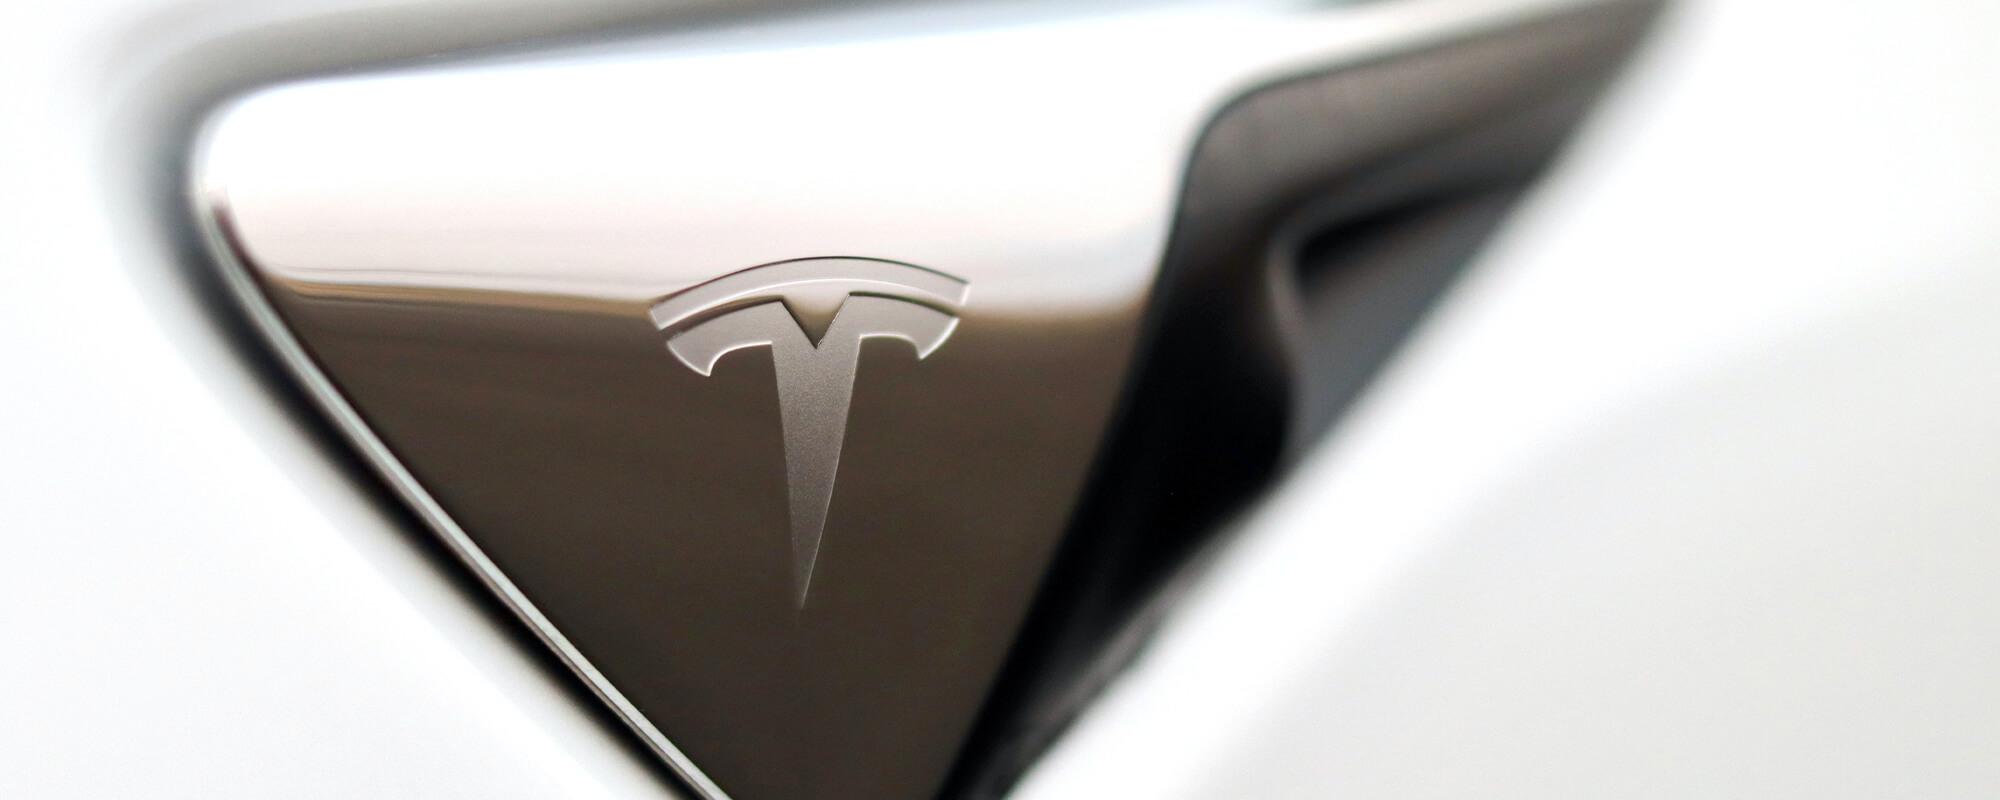 Tesla Model X Side Badge